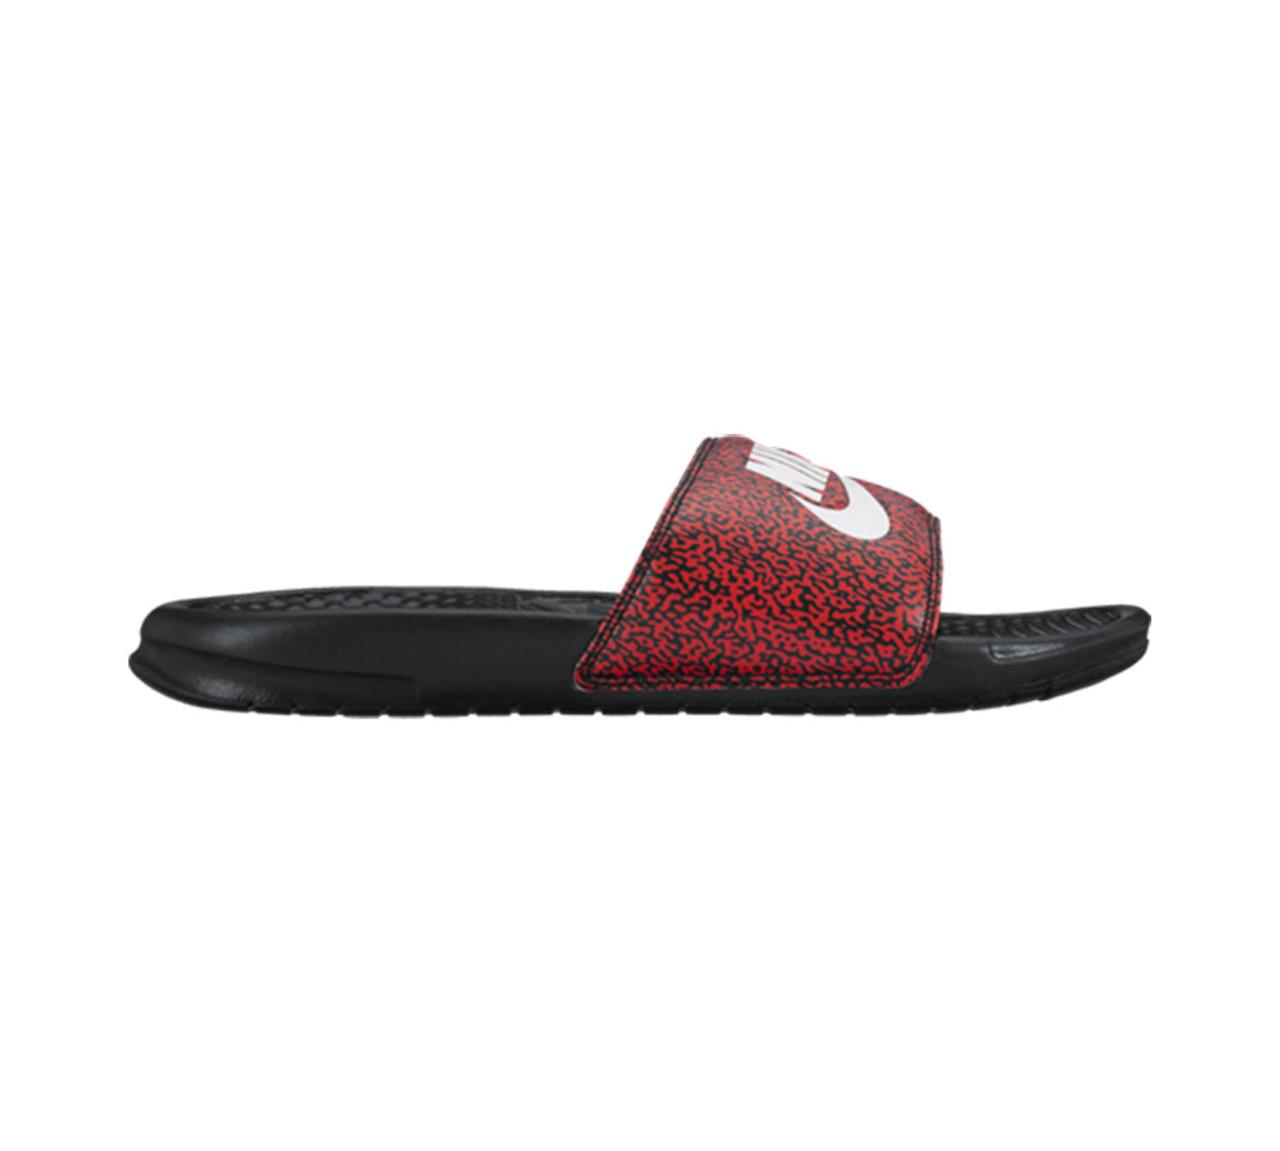 cf8aa265b949 Nike Men s Benassi JDI Print Slide Red White Black - Shop now   Shoolu